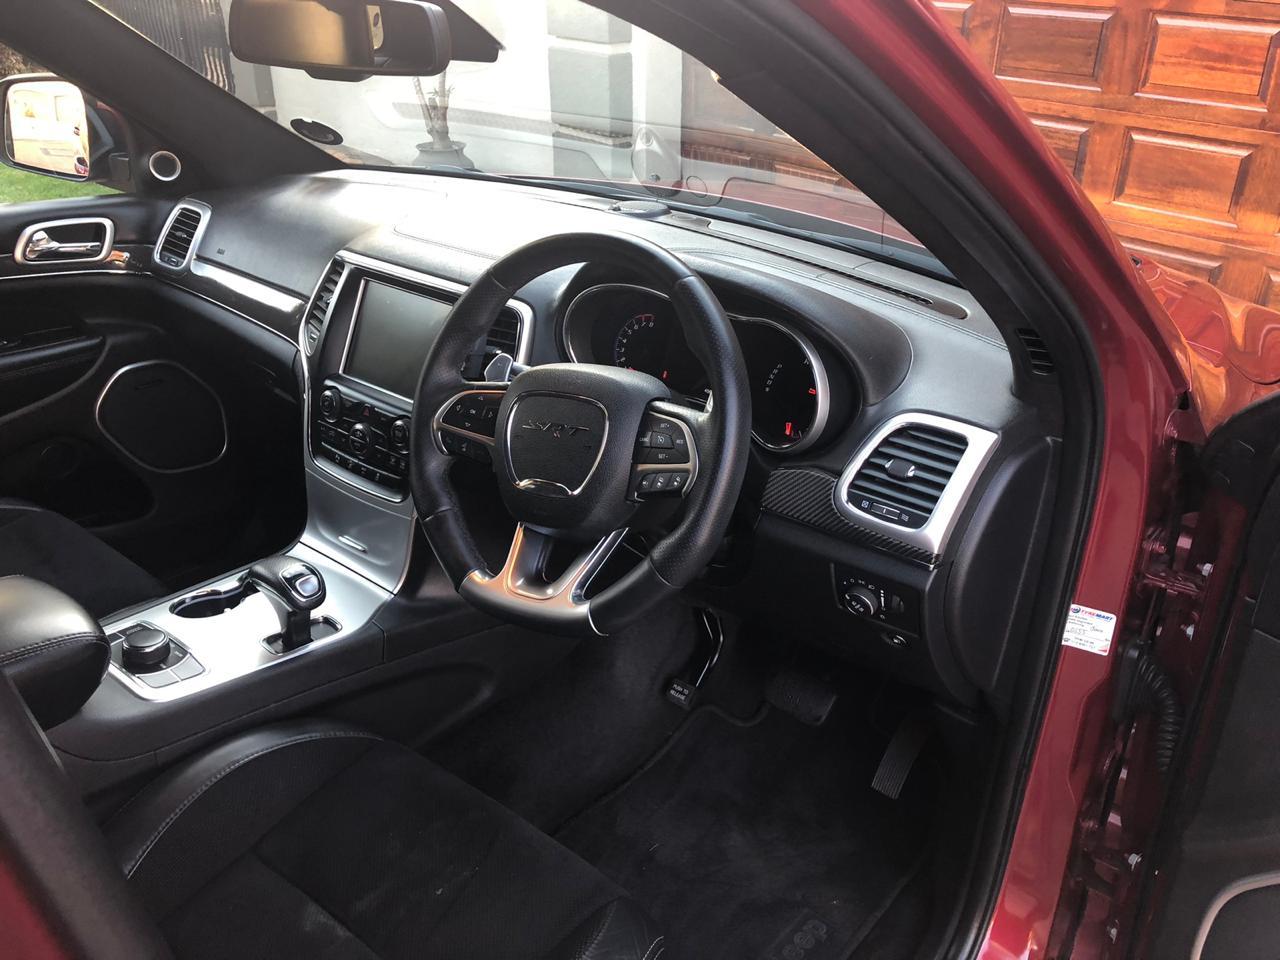 2016 Jeep Grand Cherokee SRT8